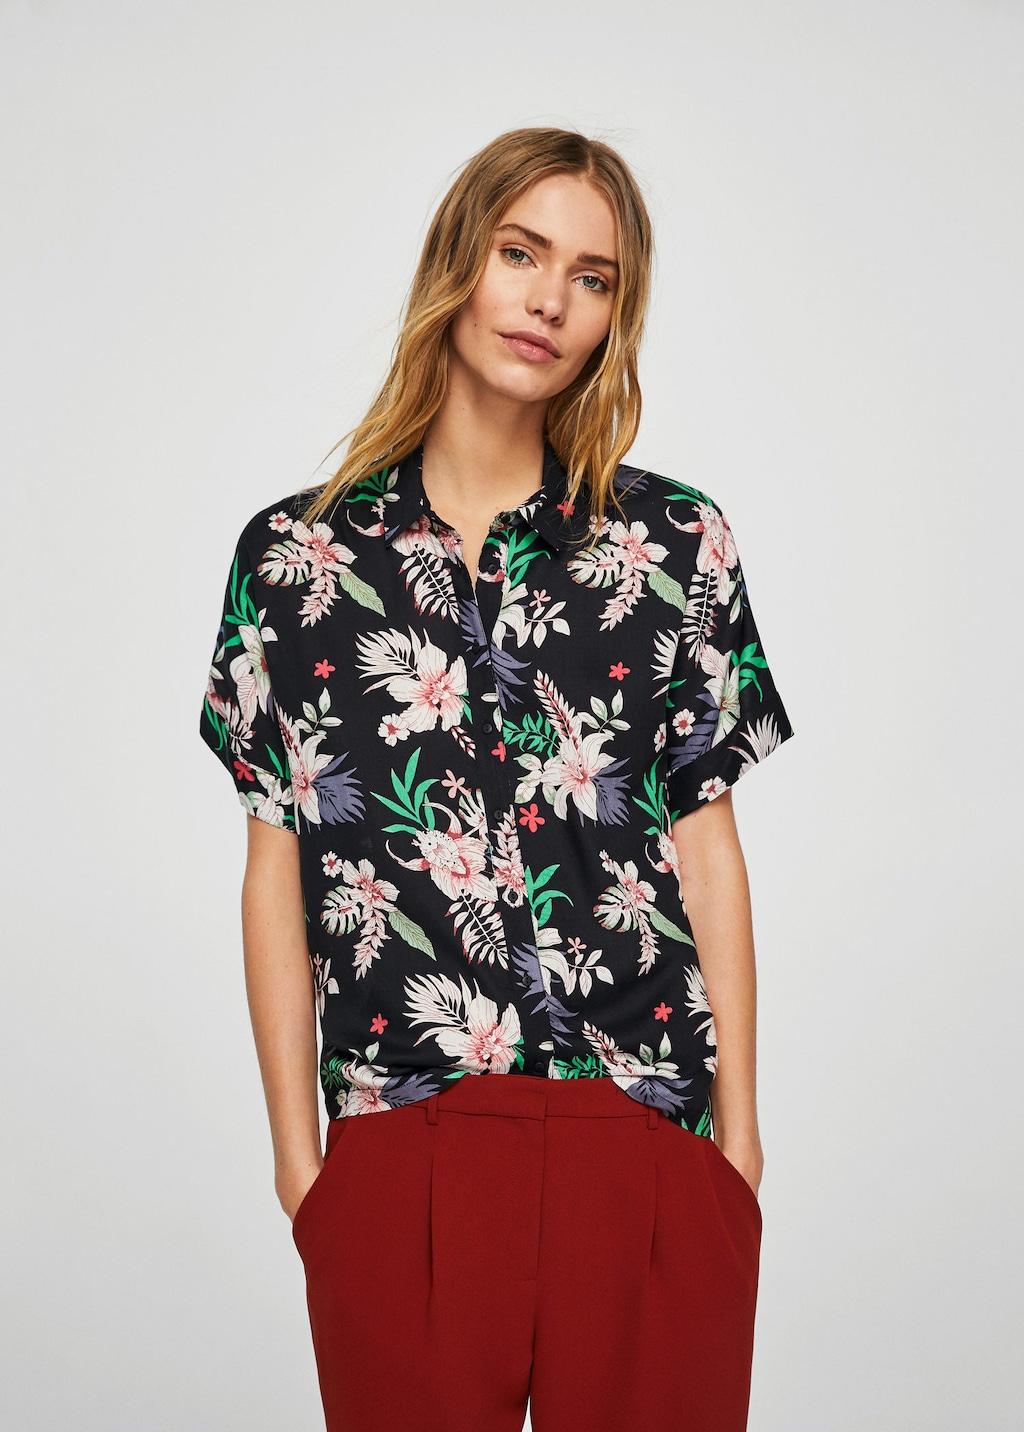 22 Hawaiian Shirts to Make Your Summer Wardrobe Way More Fun ...